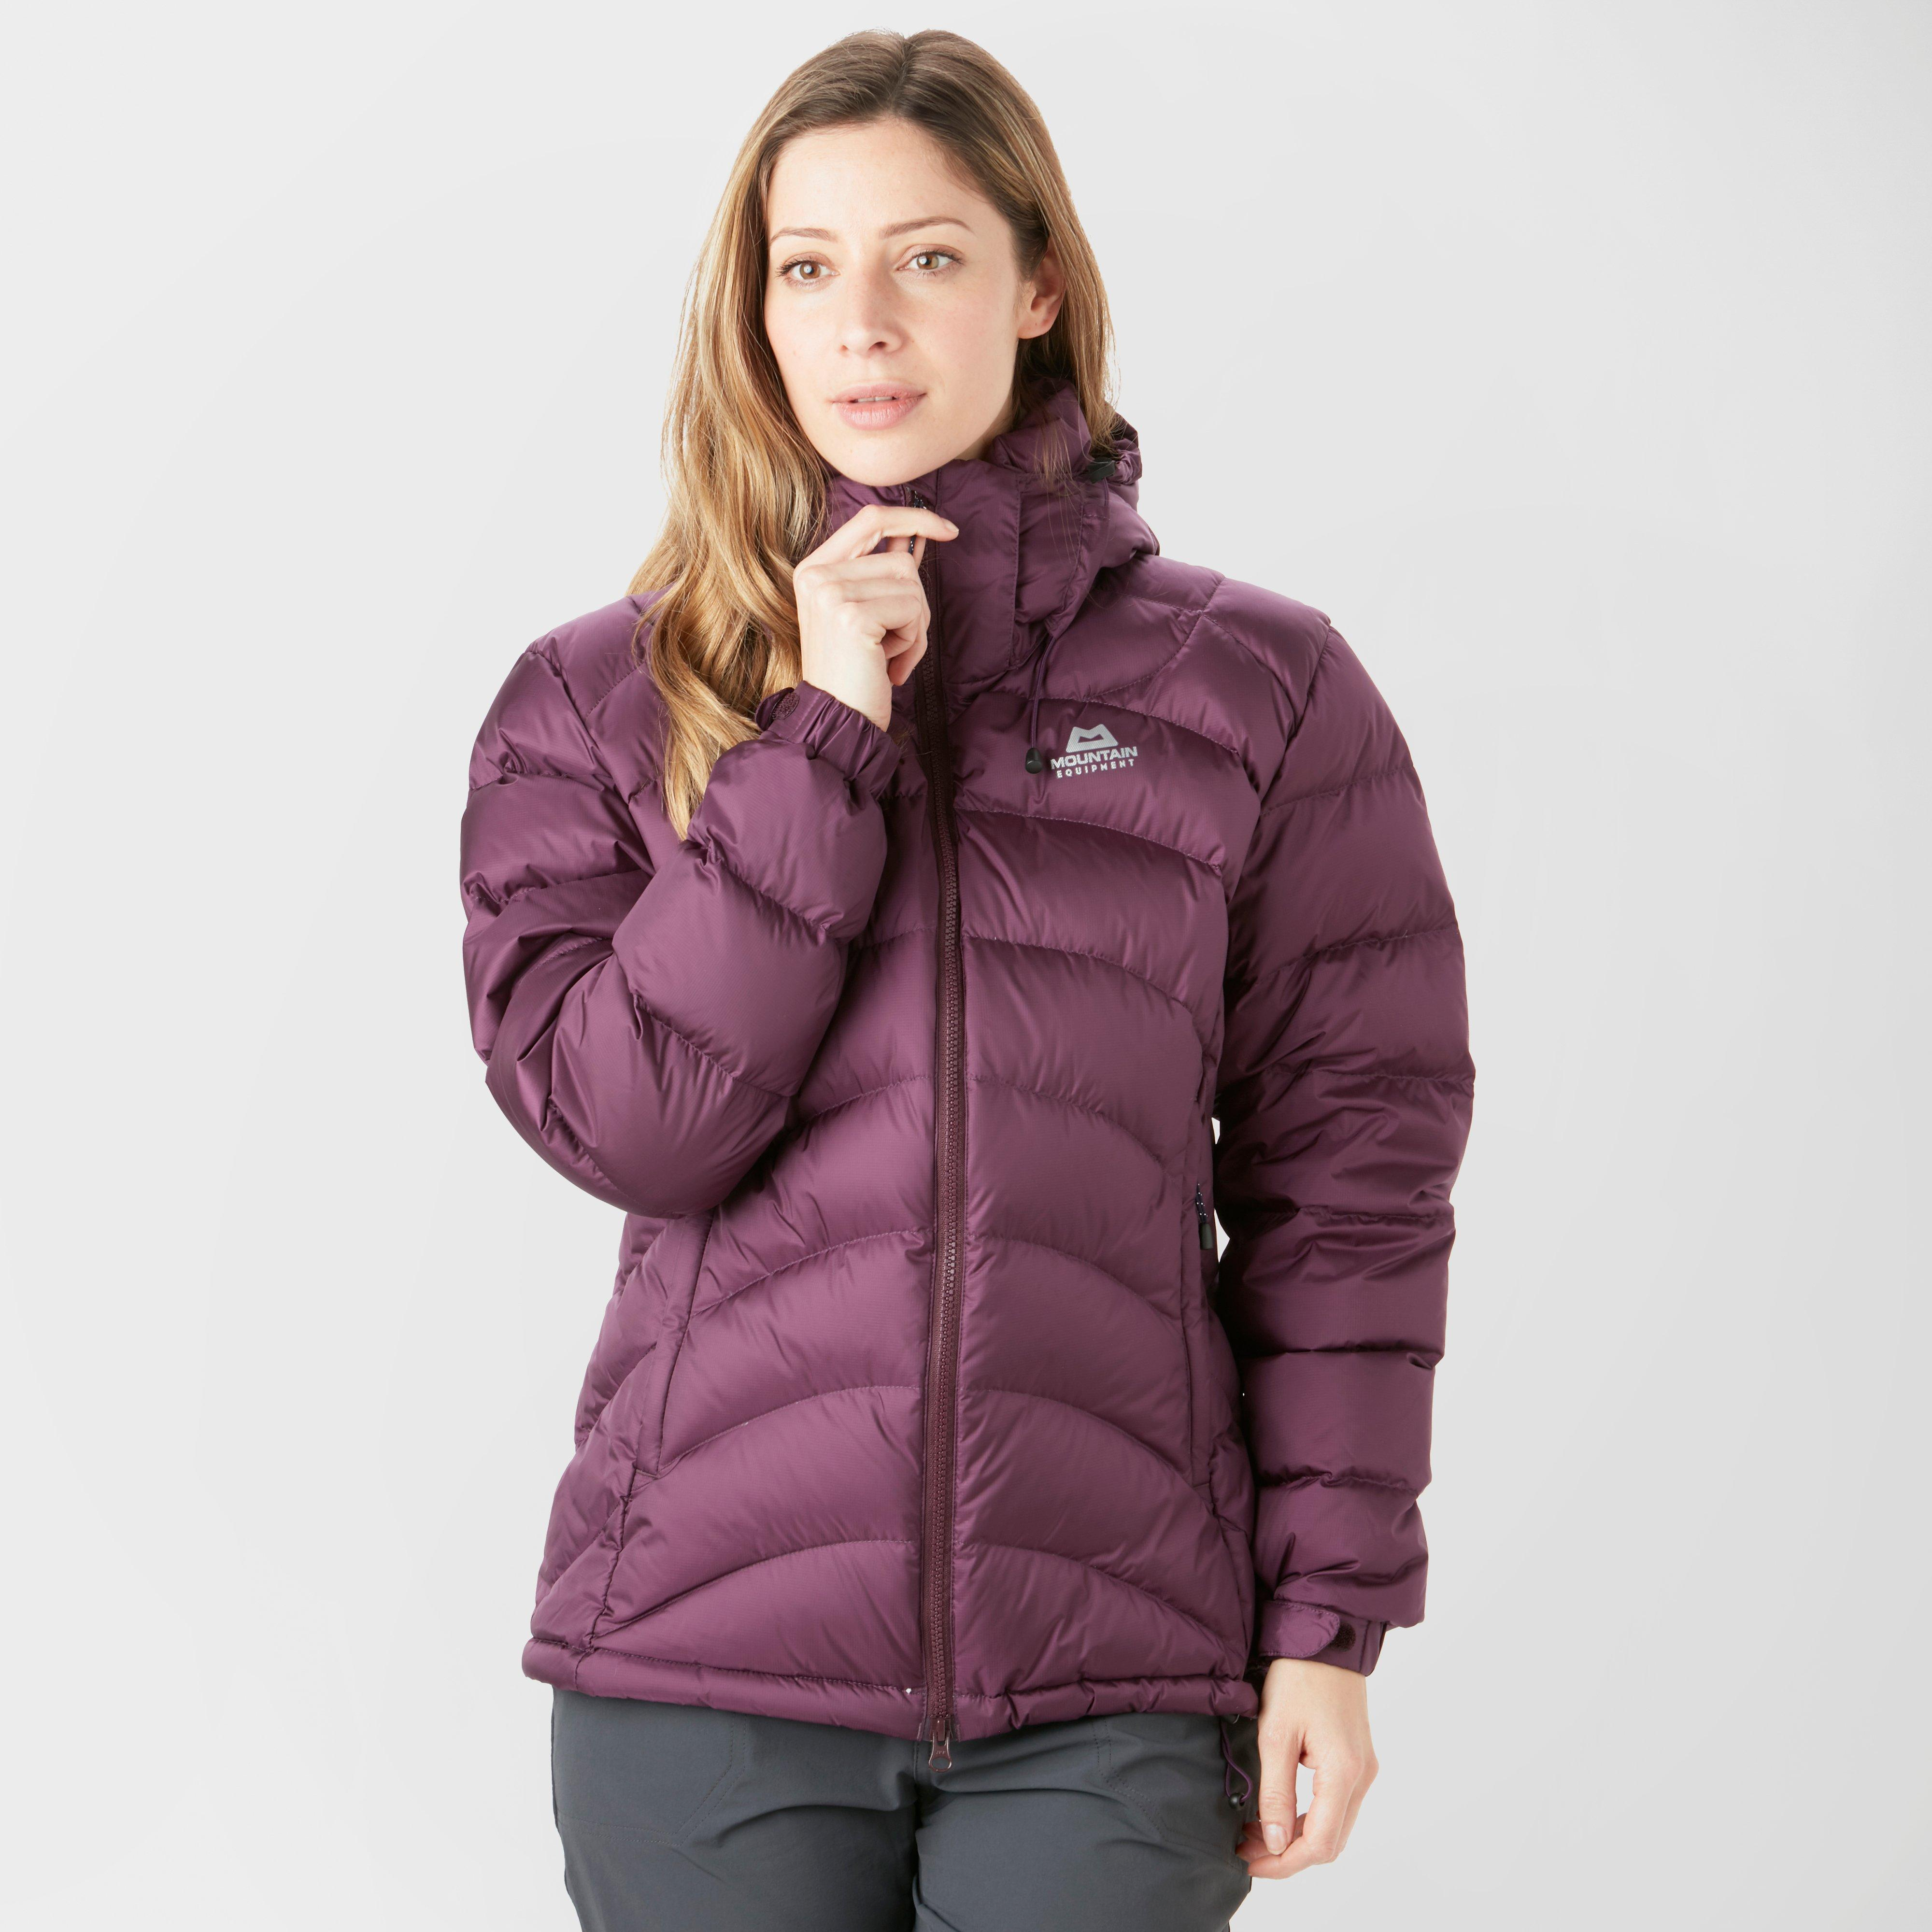 Mountain Equipment Mountain Equipment Womens Lightline Down Jacket - Plum, Plum